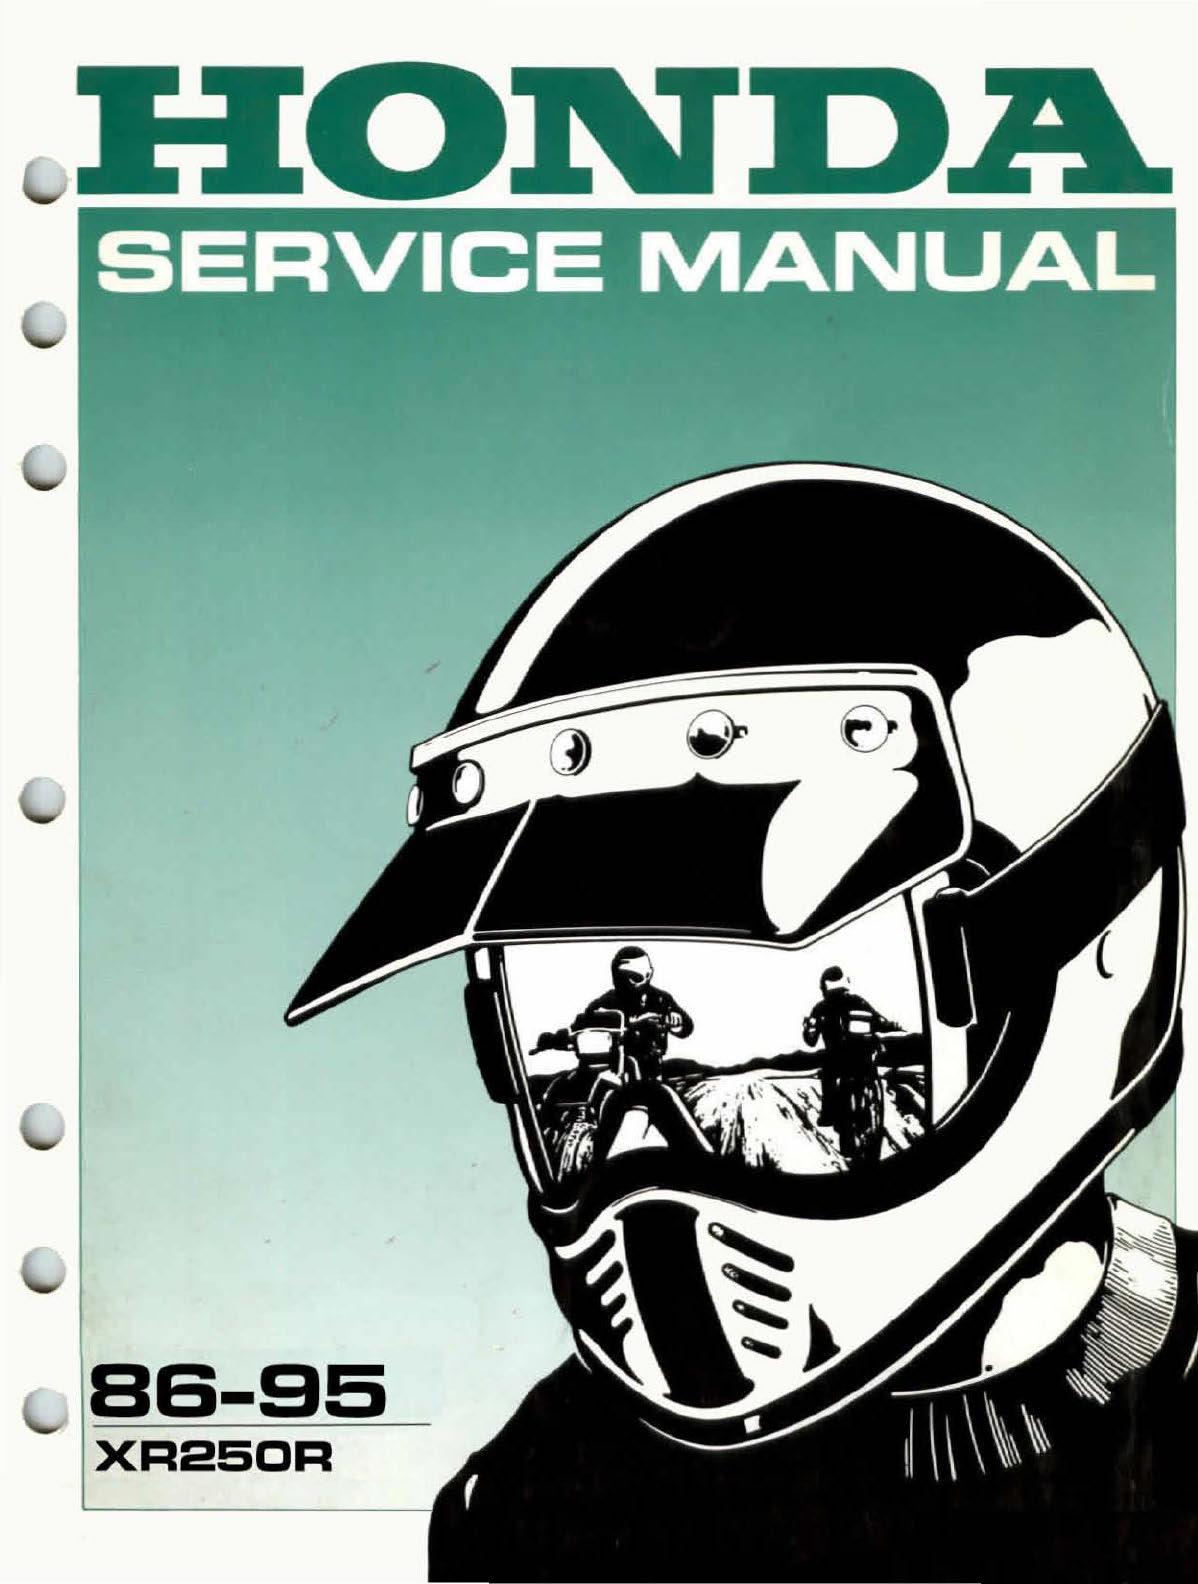 Workshop Manual for Honda XR250R (1986-1995)